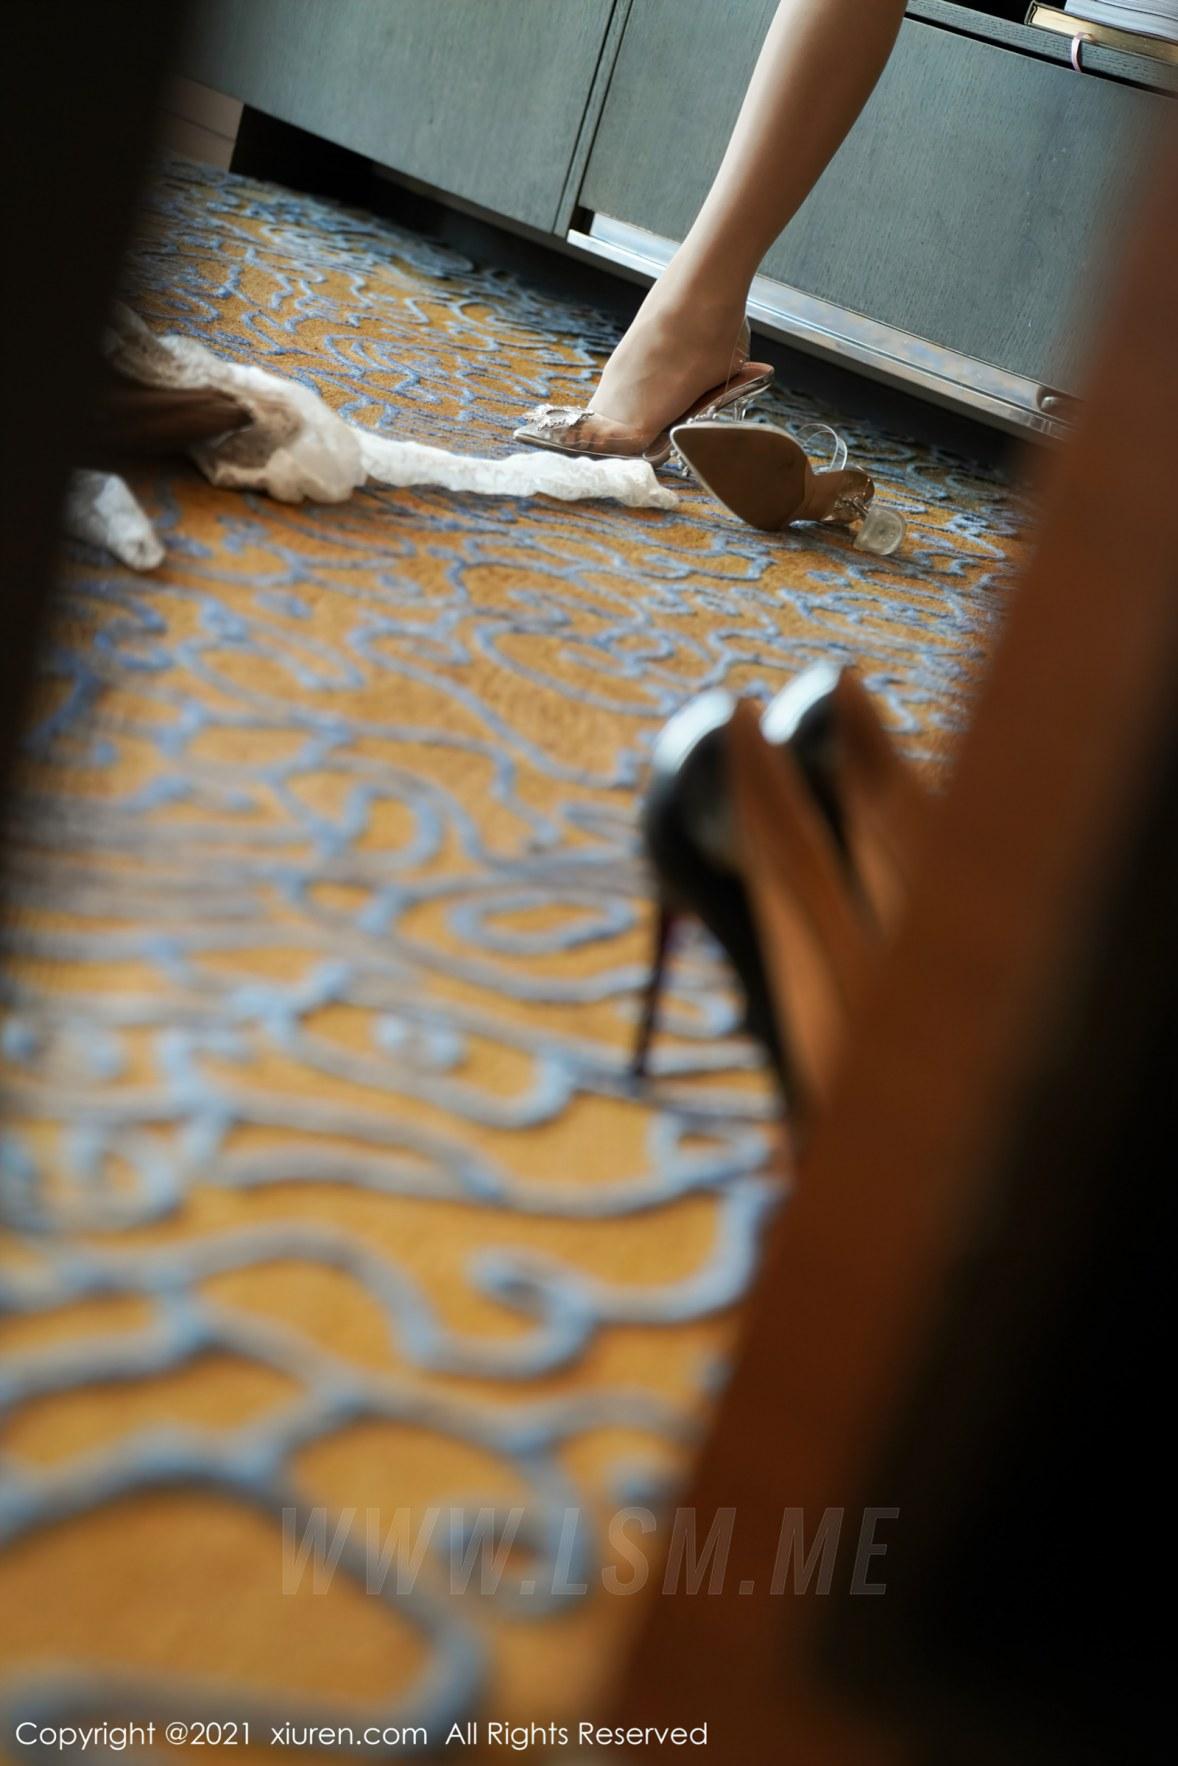 3719 035 g59 3603 5400 - XiuRen 秀人 No.3719 白色礼裙 果儿Victoria 御姐北京旅拍3 - 秀人网 -【免费在线写真】【丽人丝语】